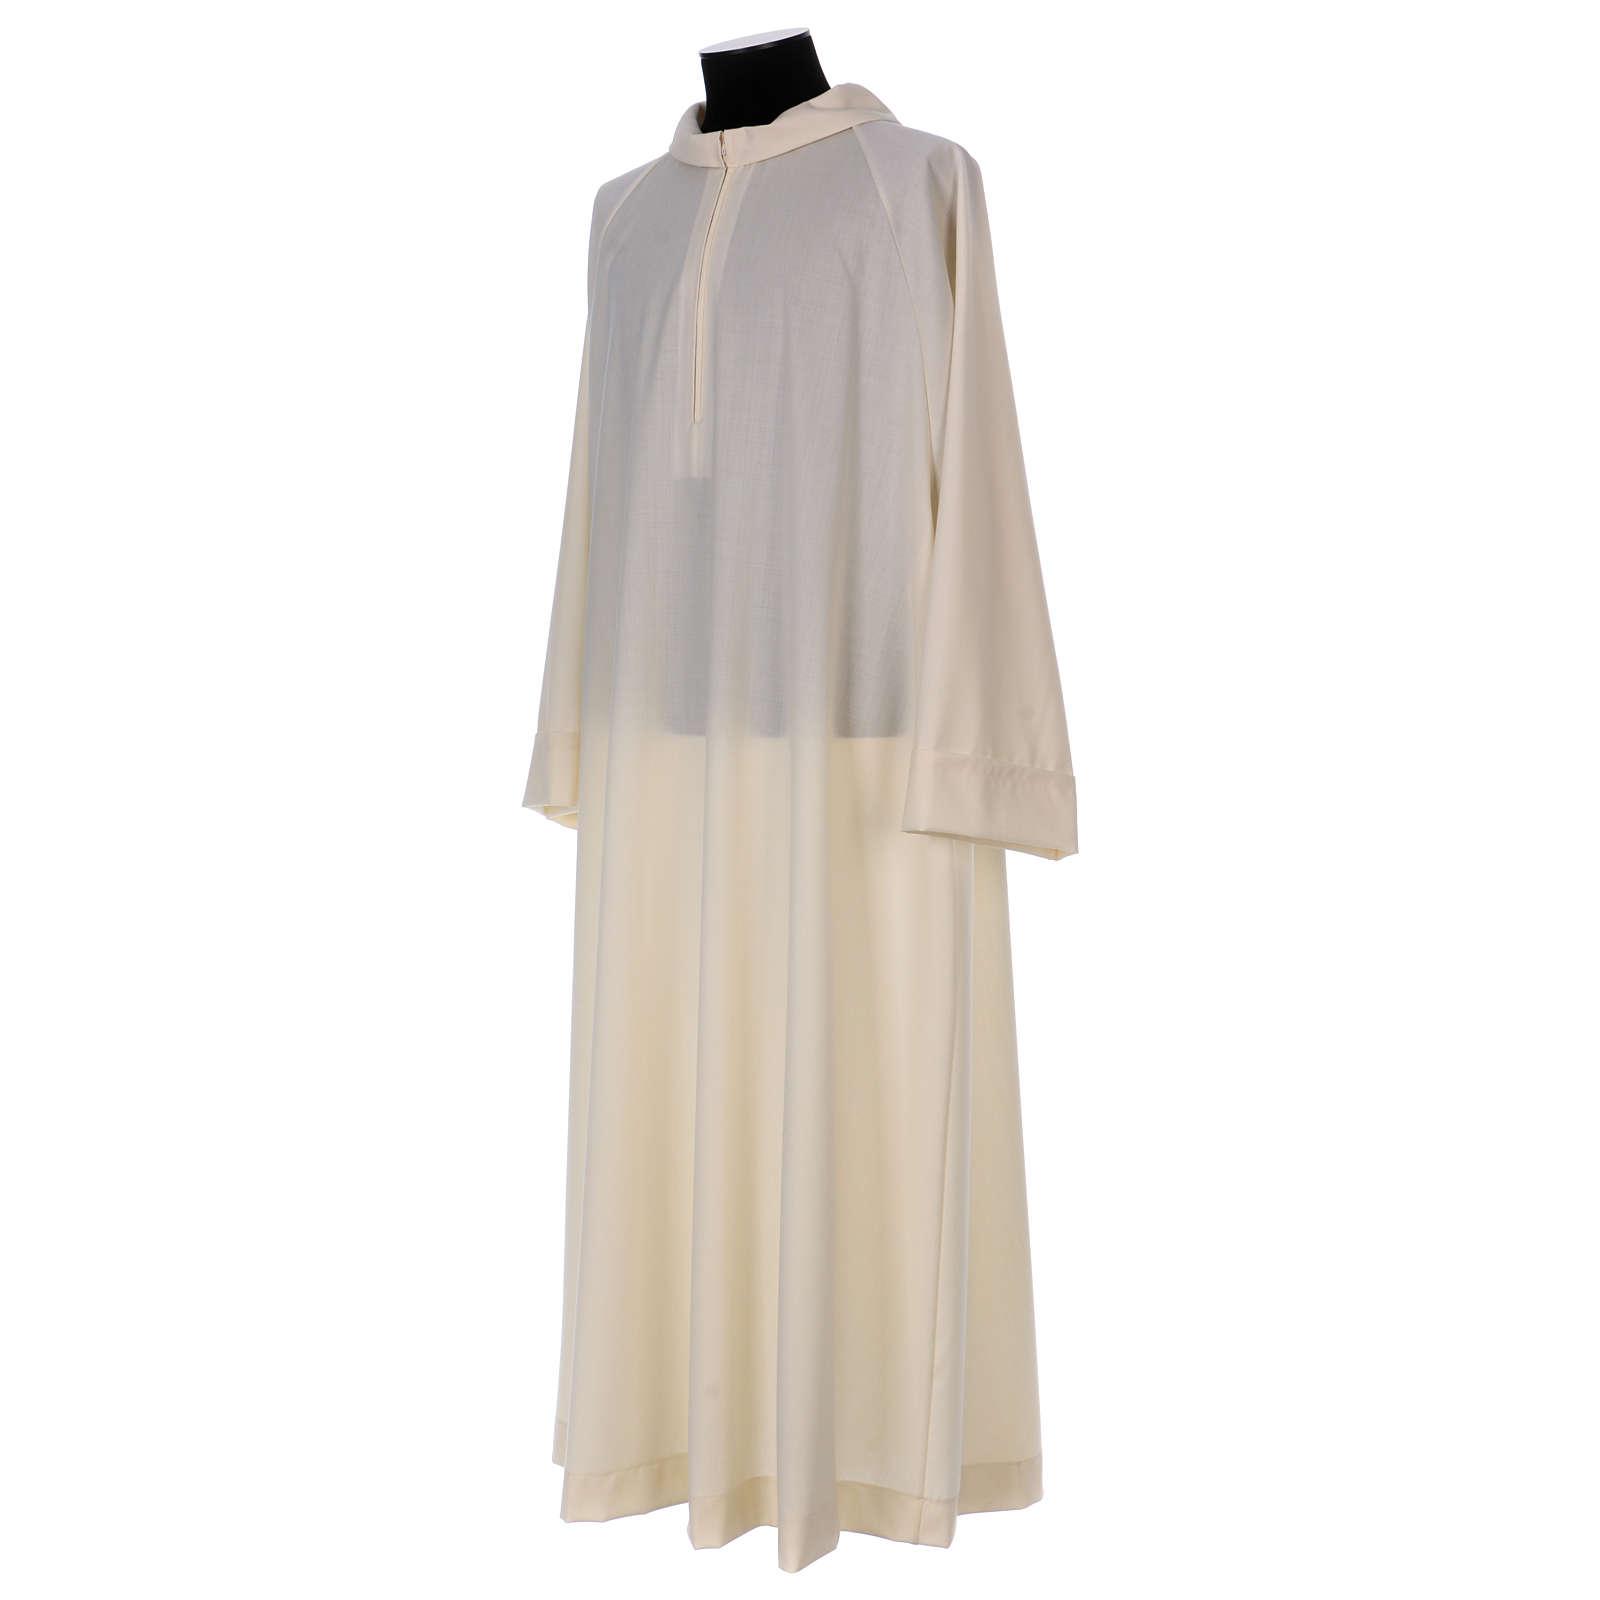 Camice avorio 100% pura lana cerniera davanti 4